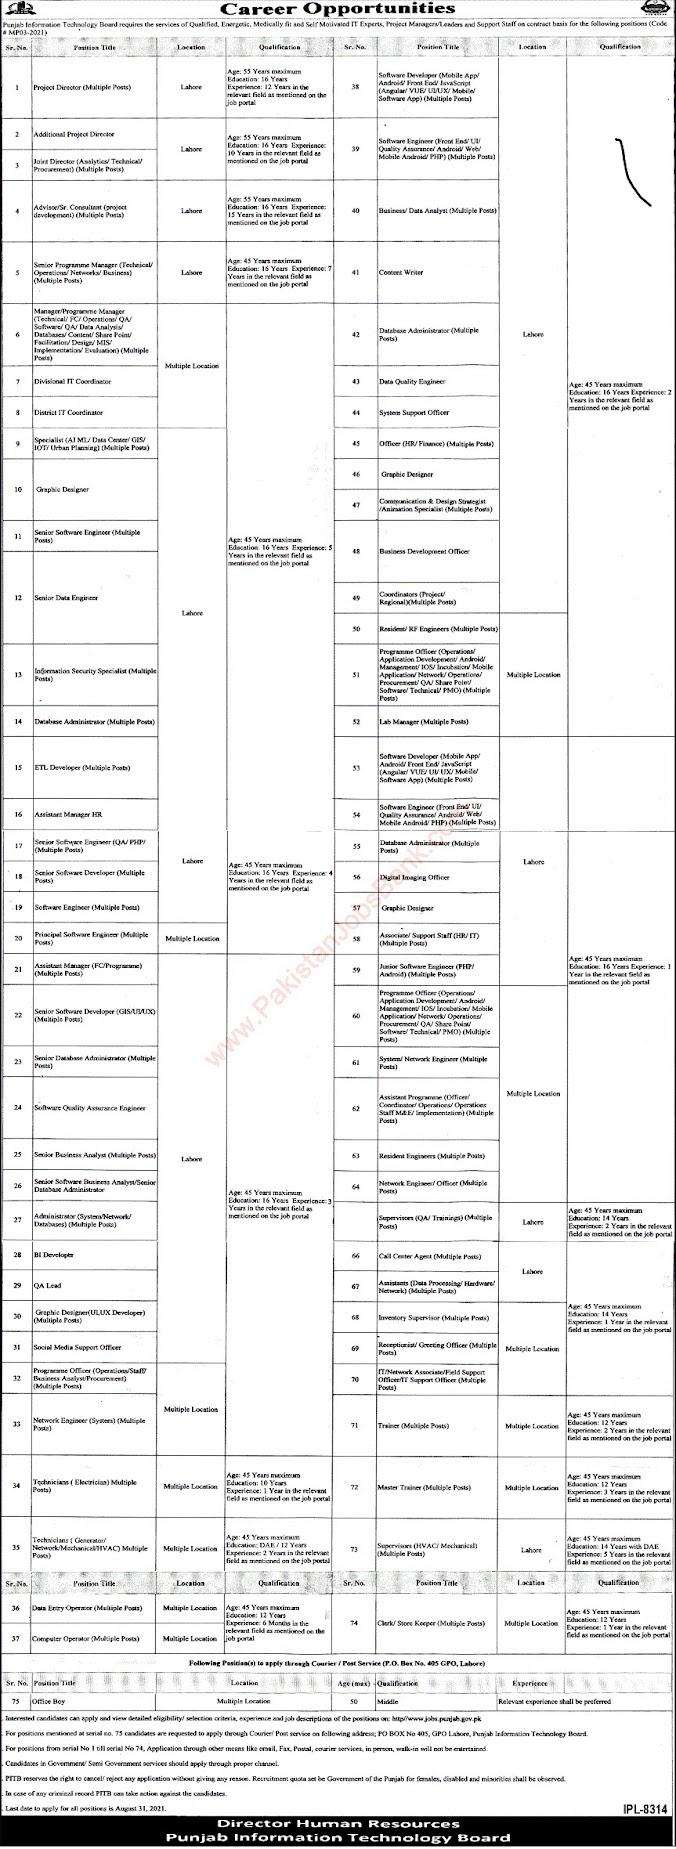 Punjab Information Technology Board PITB latest Vacancy - 1000+ Posts Online Apply